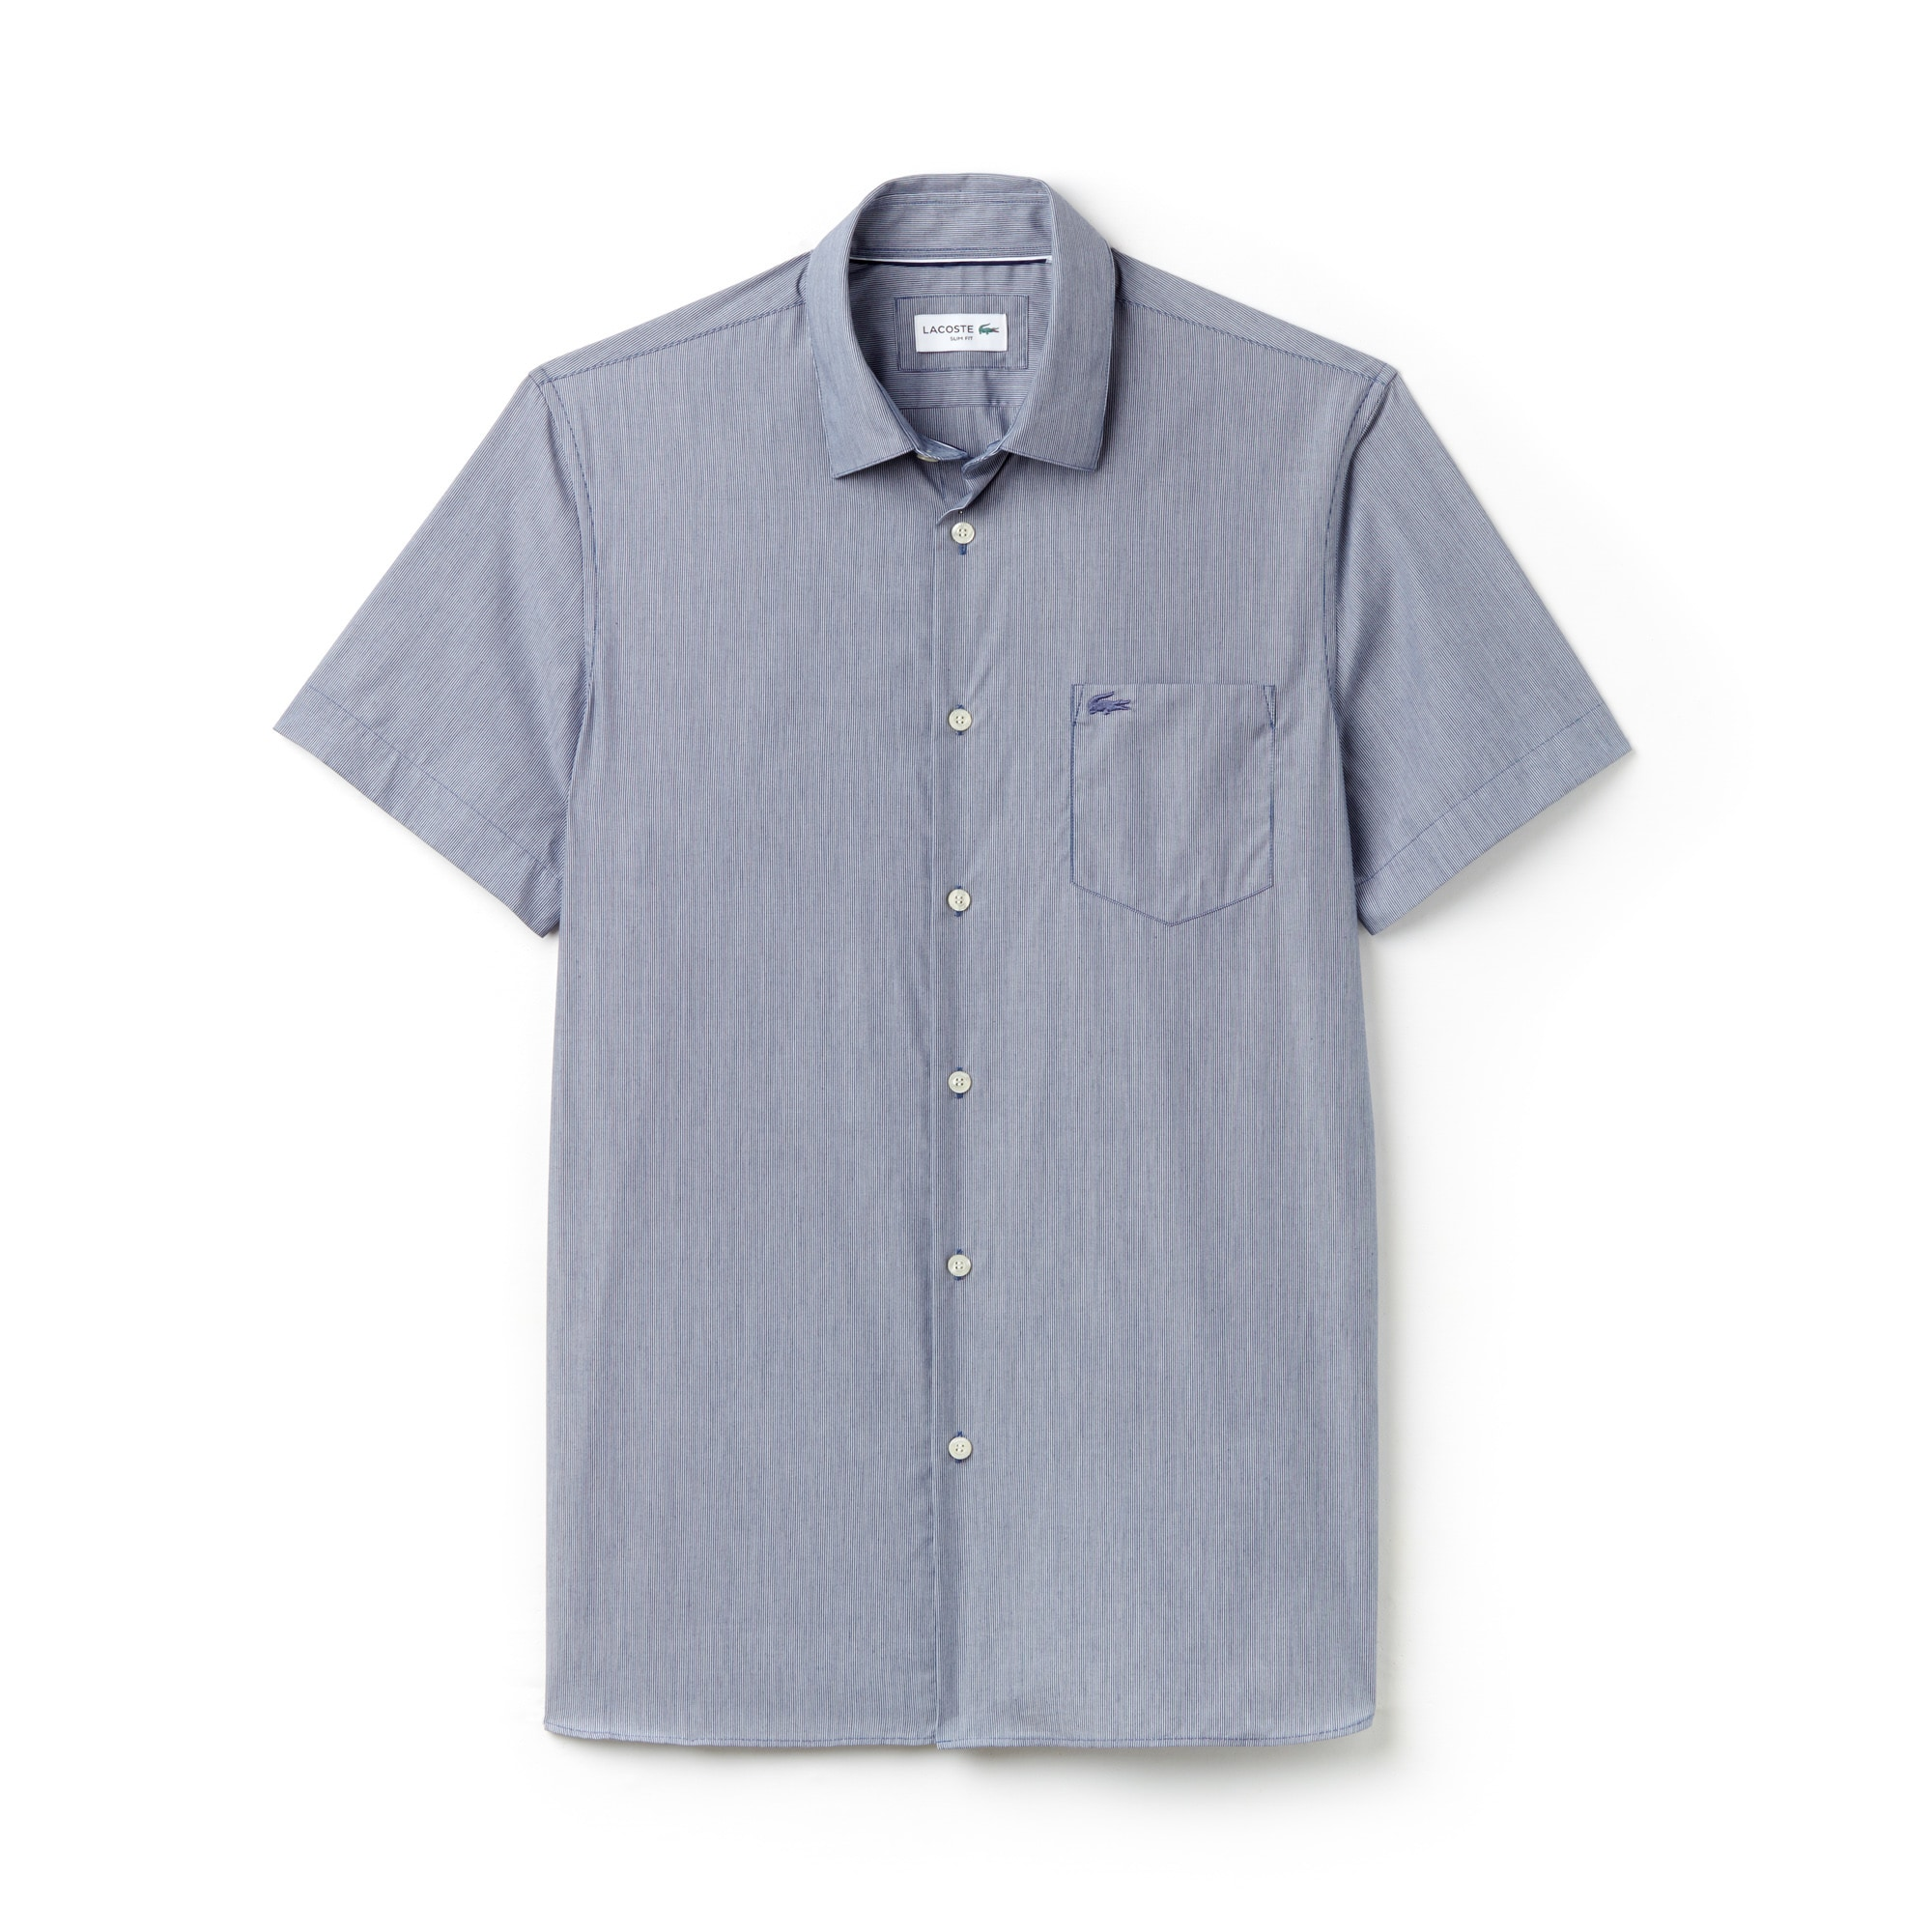 25% de desconto. Camisa Lacoste masculina ... 908d5d4864d